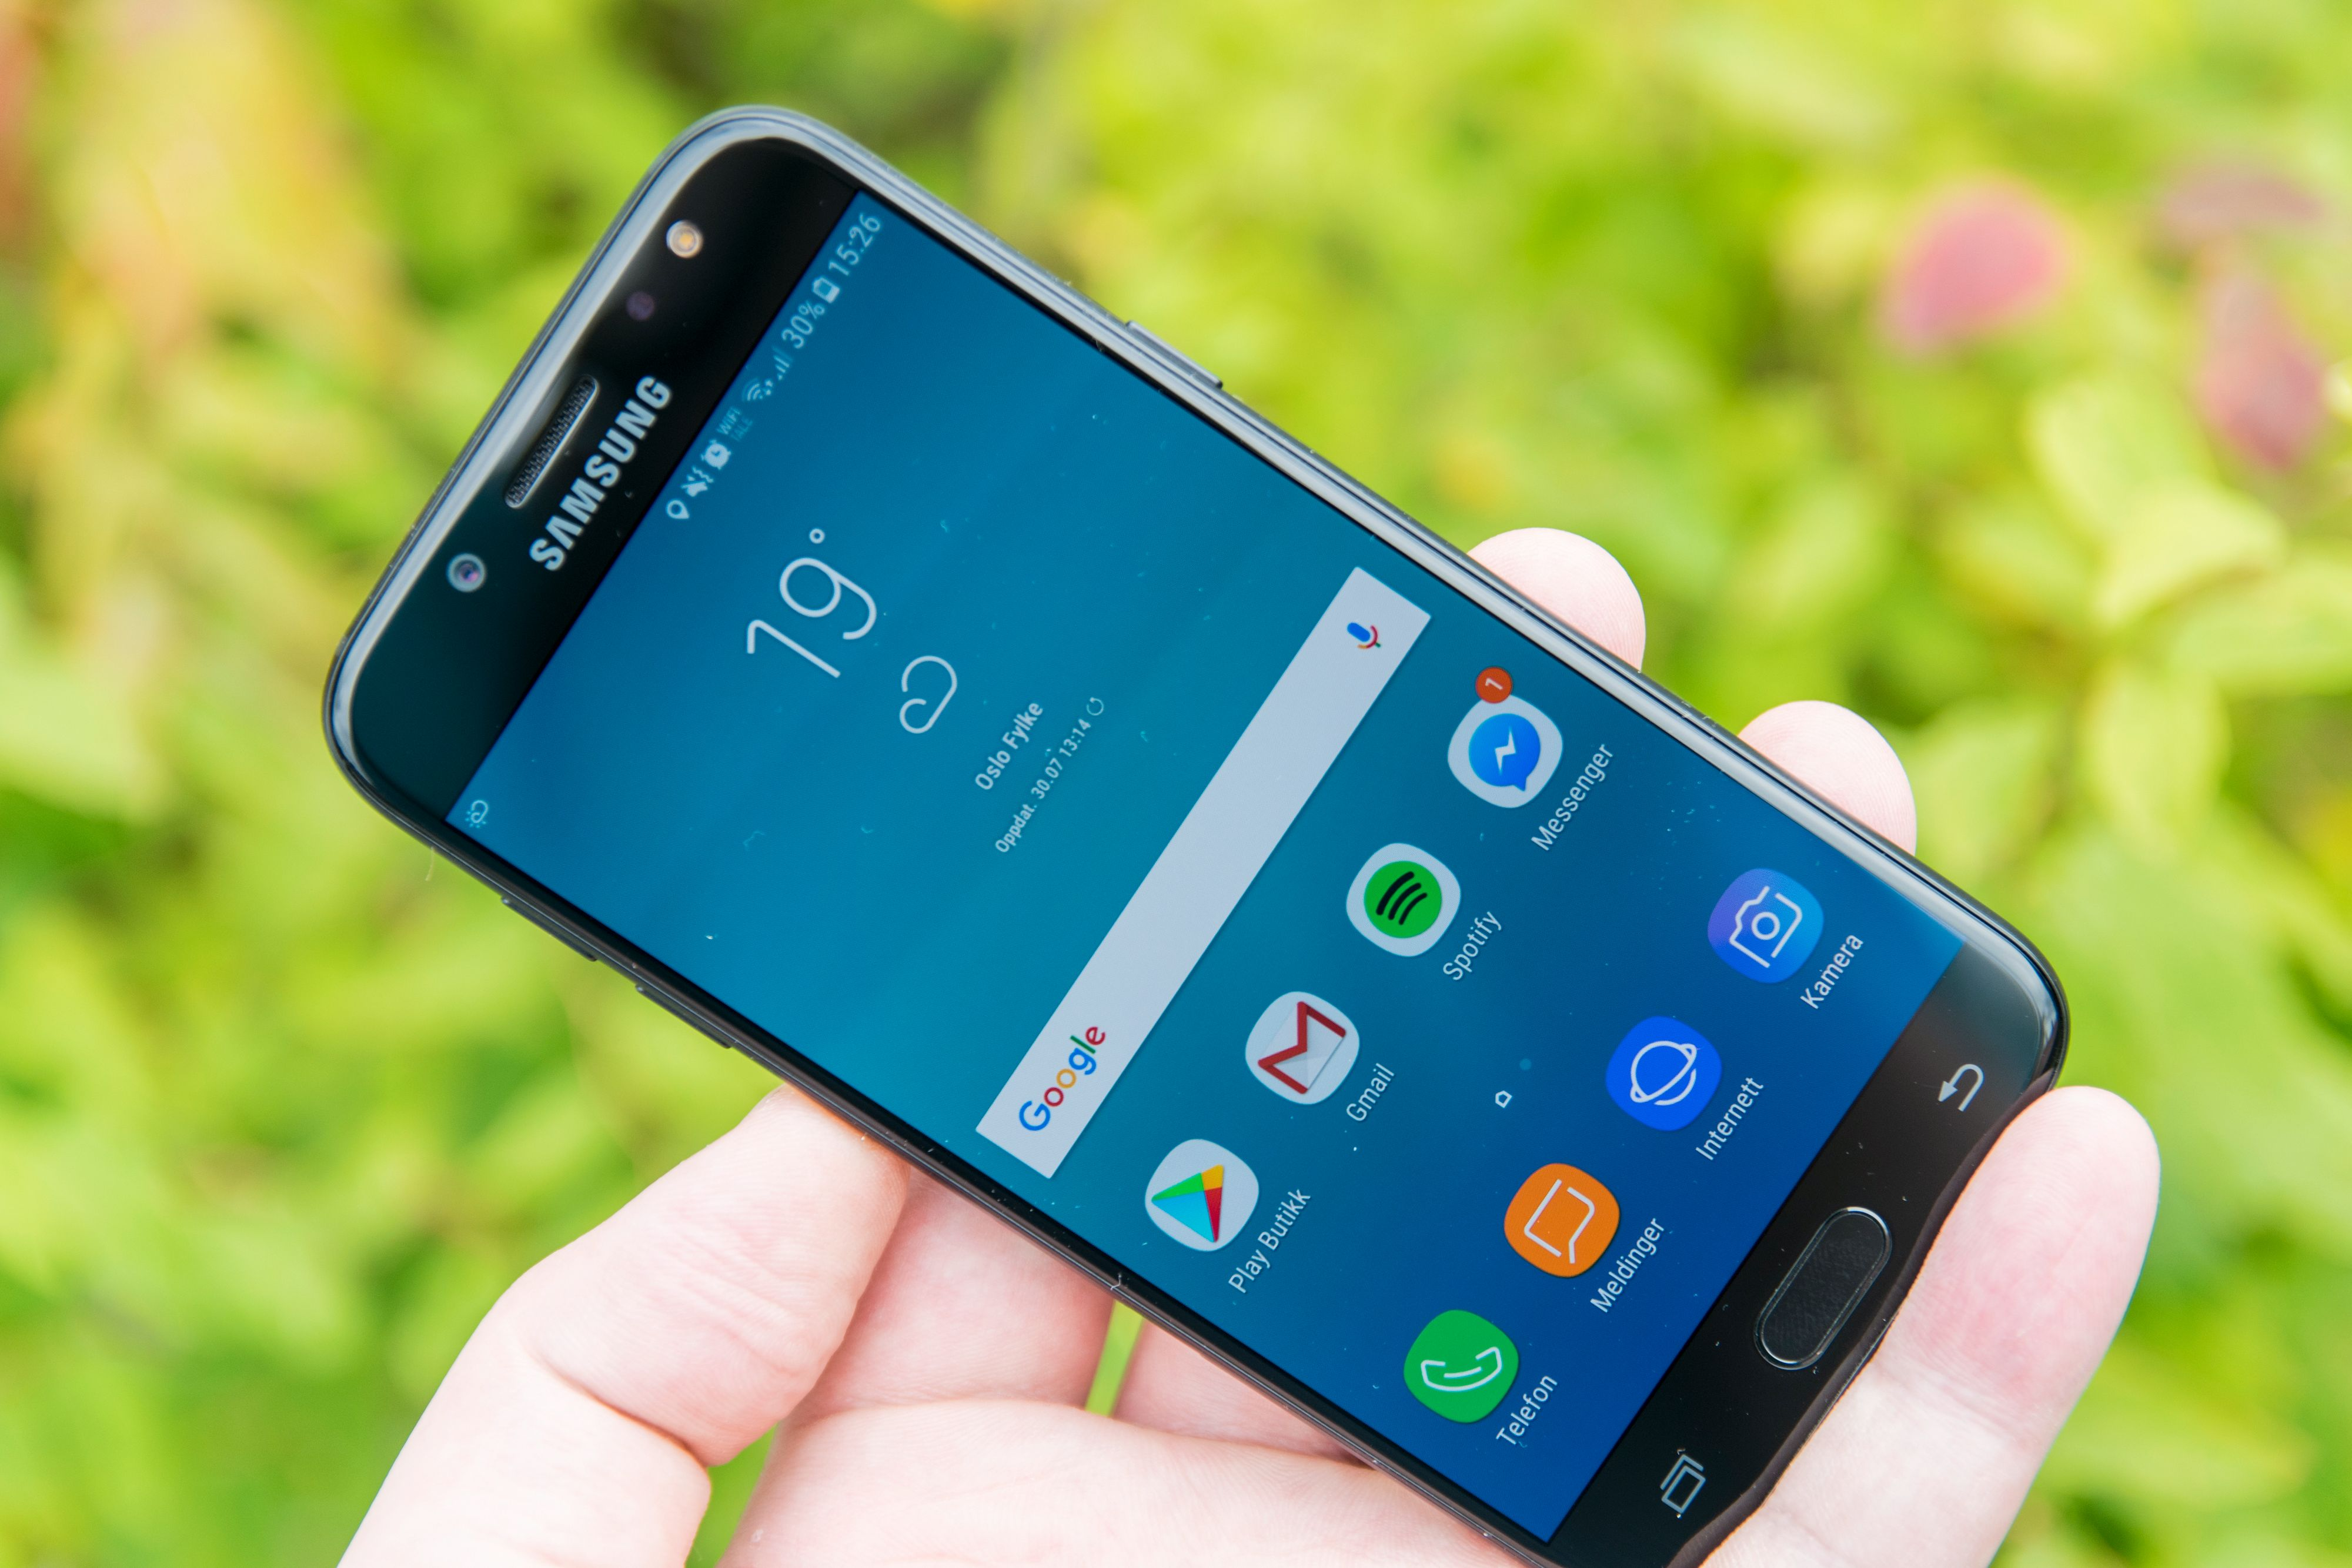 Menyer og ikoner er de samme som på Galaxy S8, men ytelsen er dessverre ikke like god..